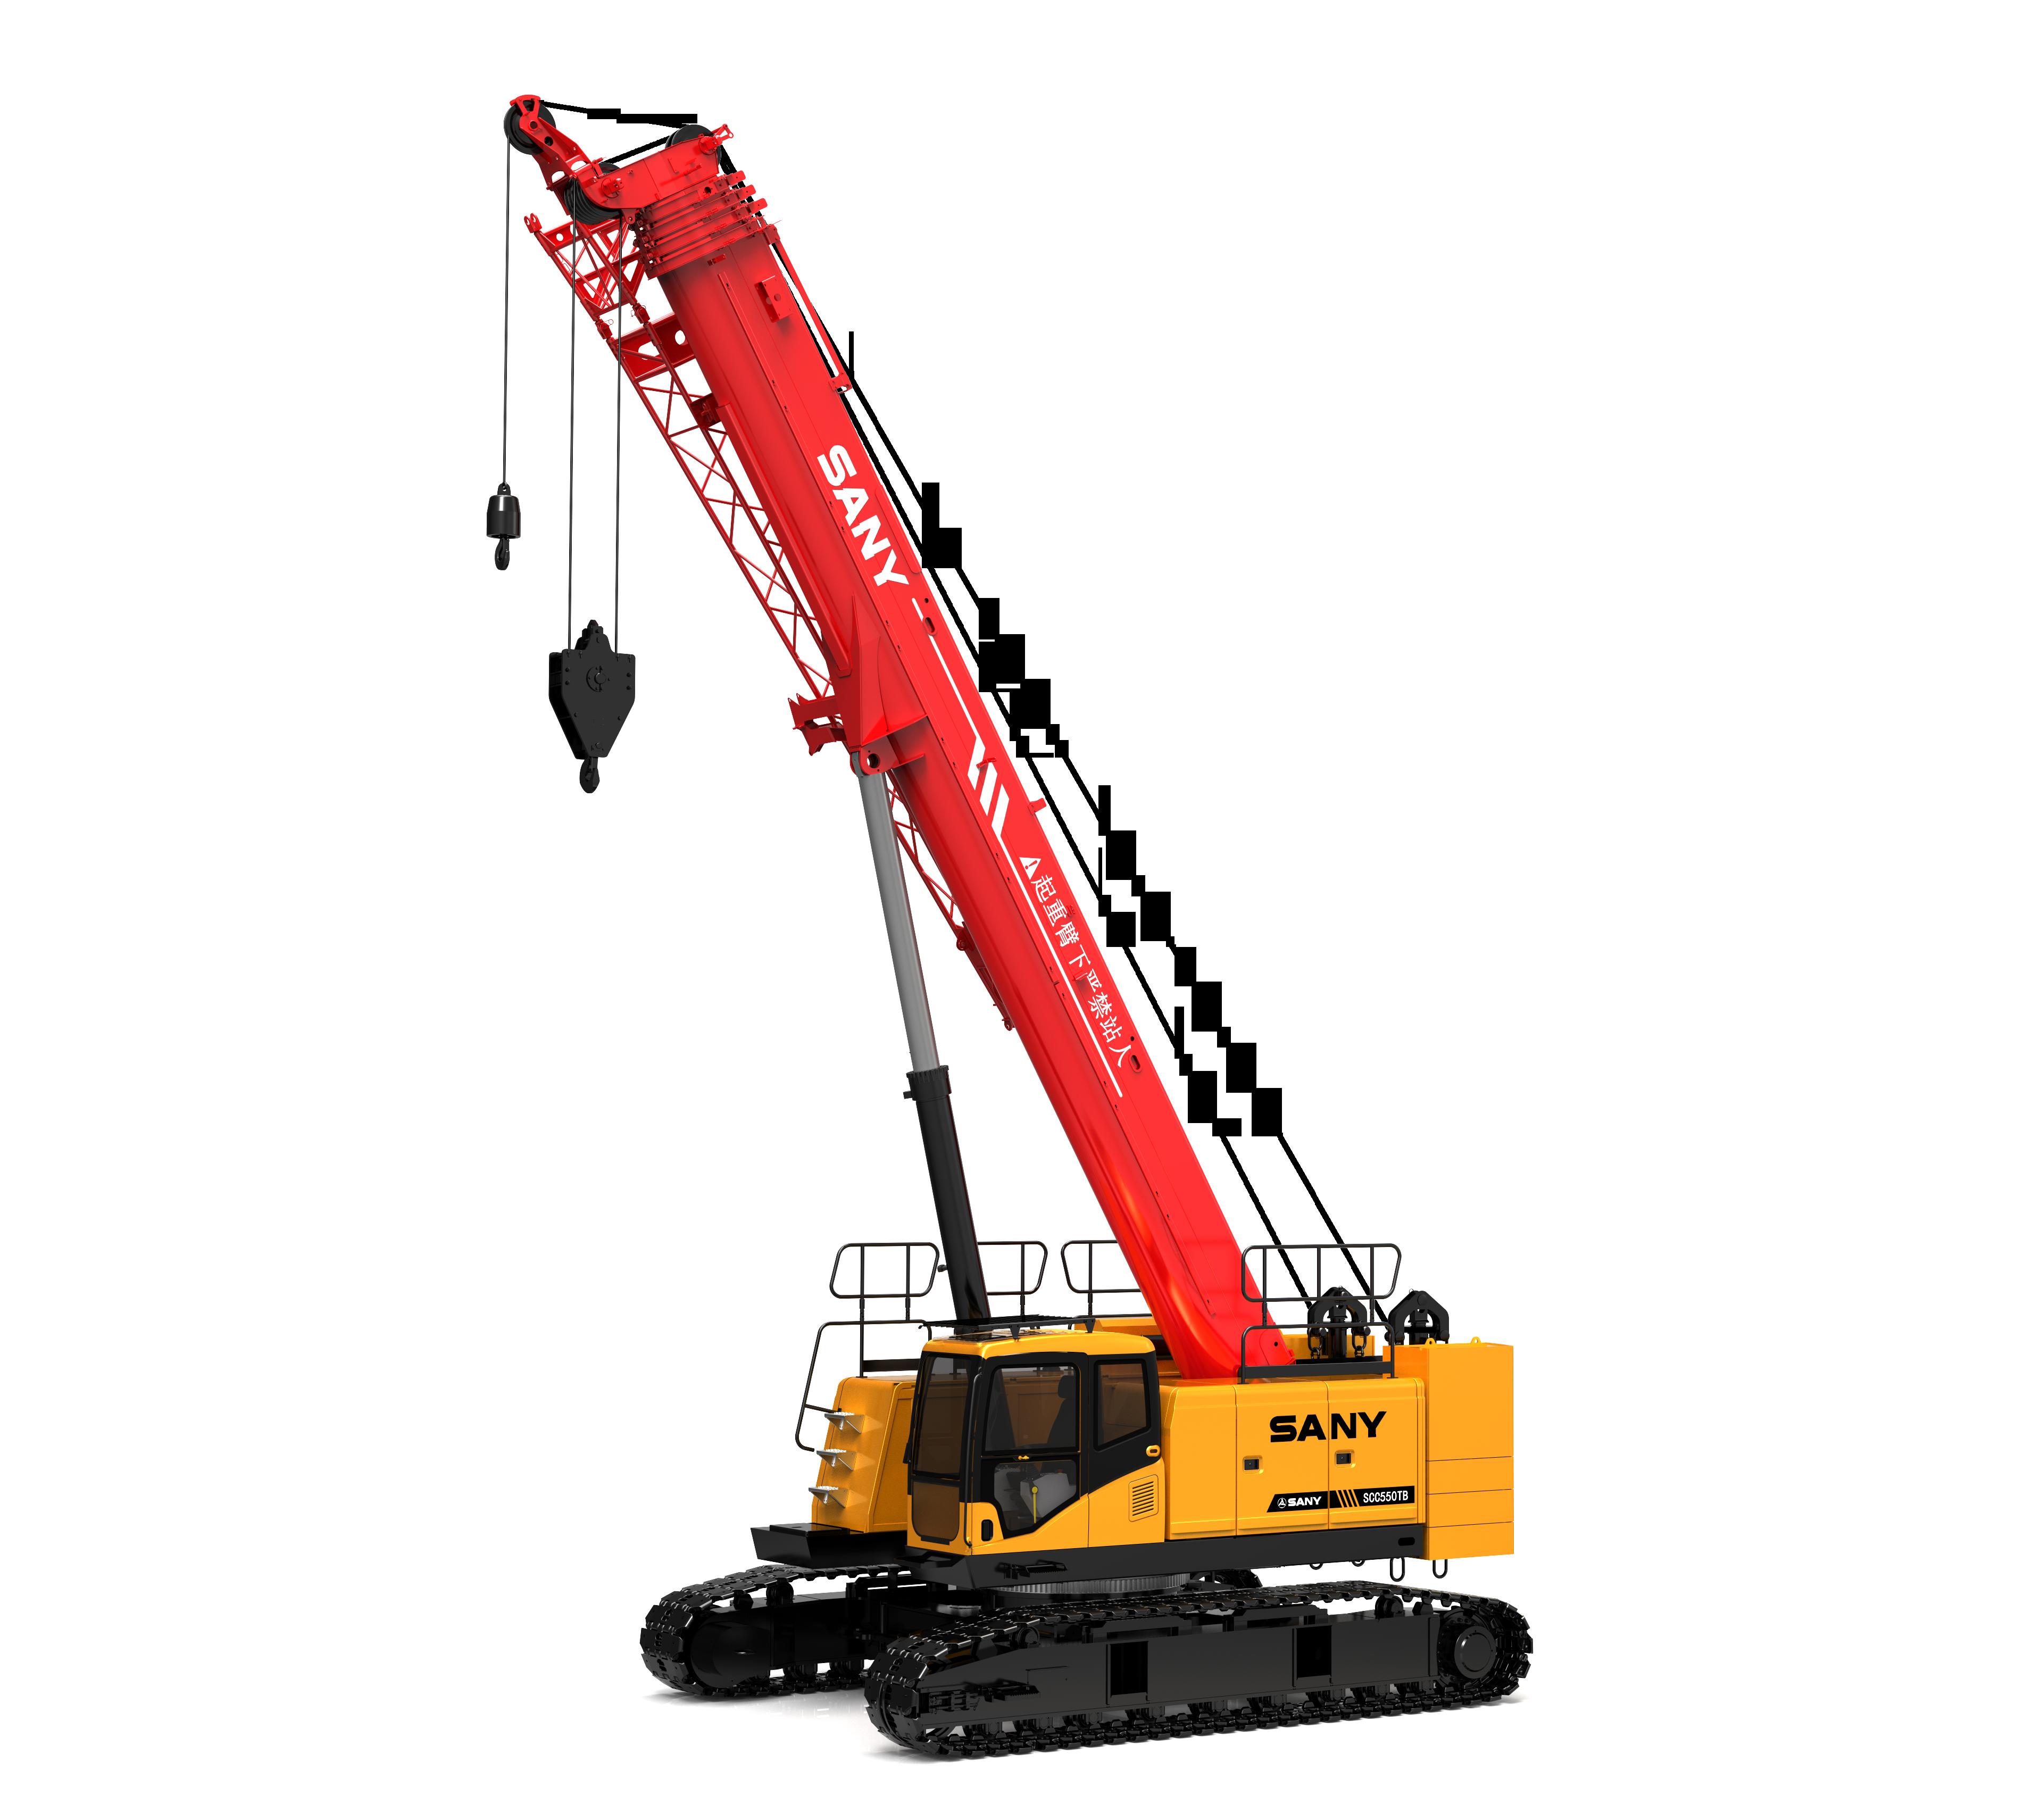 Crane Machine | Truck Cranes for Sale | Hydraulic Cranes